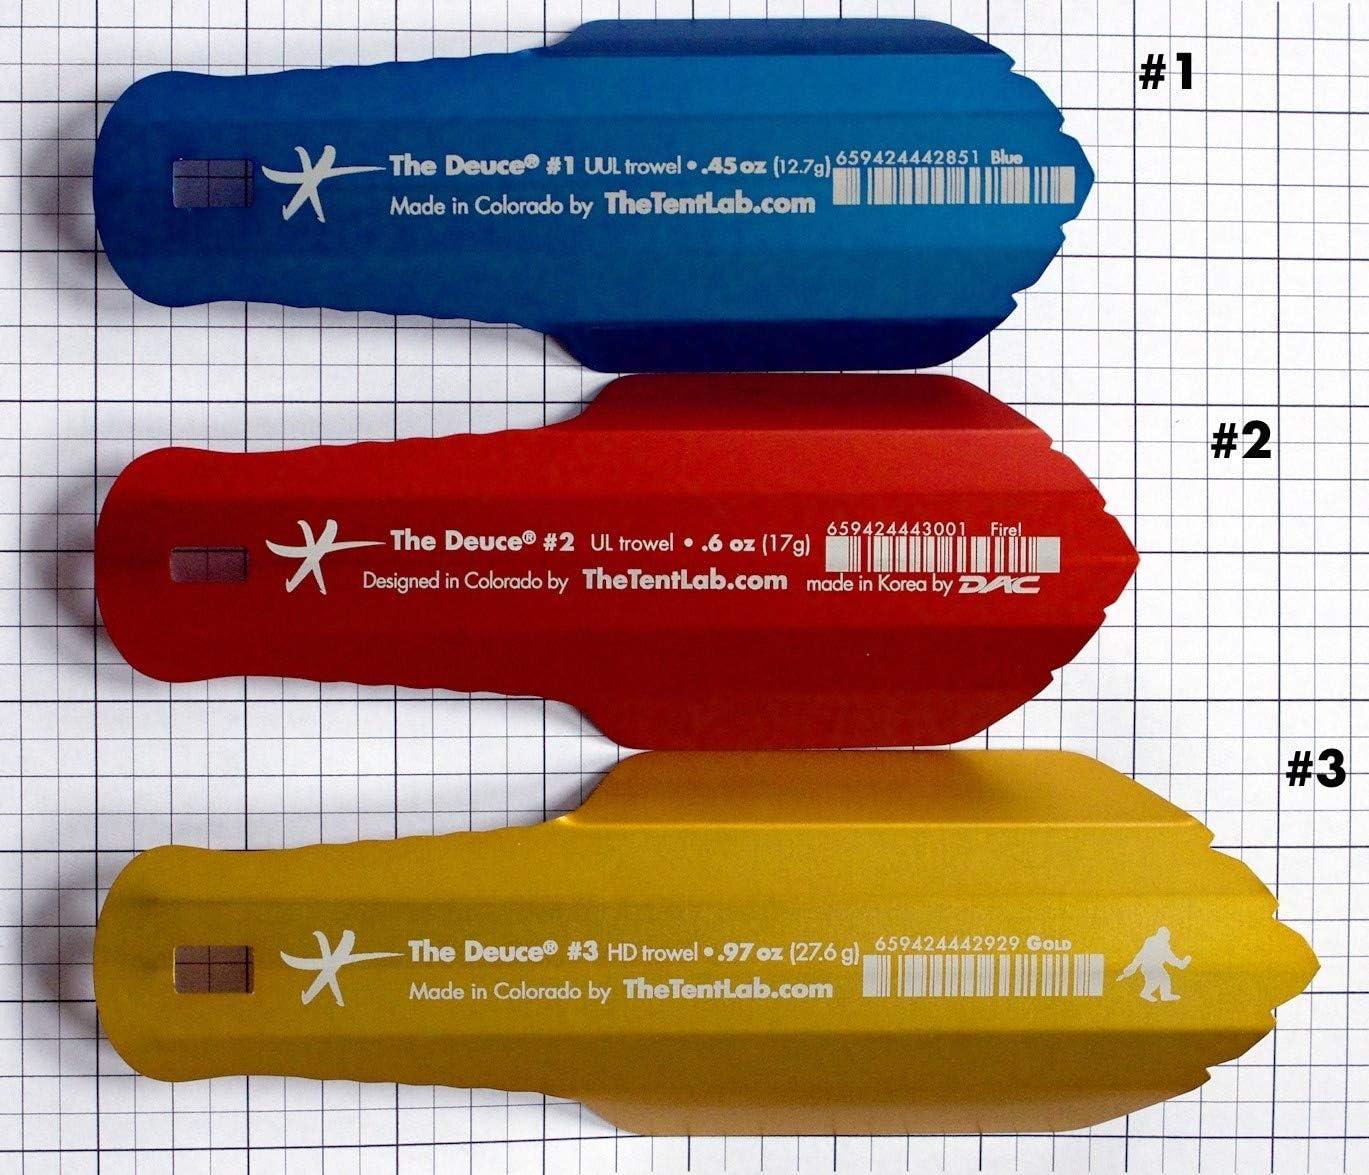 R Sky, 3 Now in 3 Sizes Ultralight Backpacking Potty Trowel TheTentLab New Improved Deuce